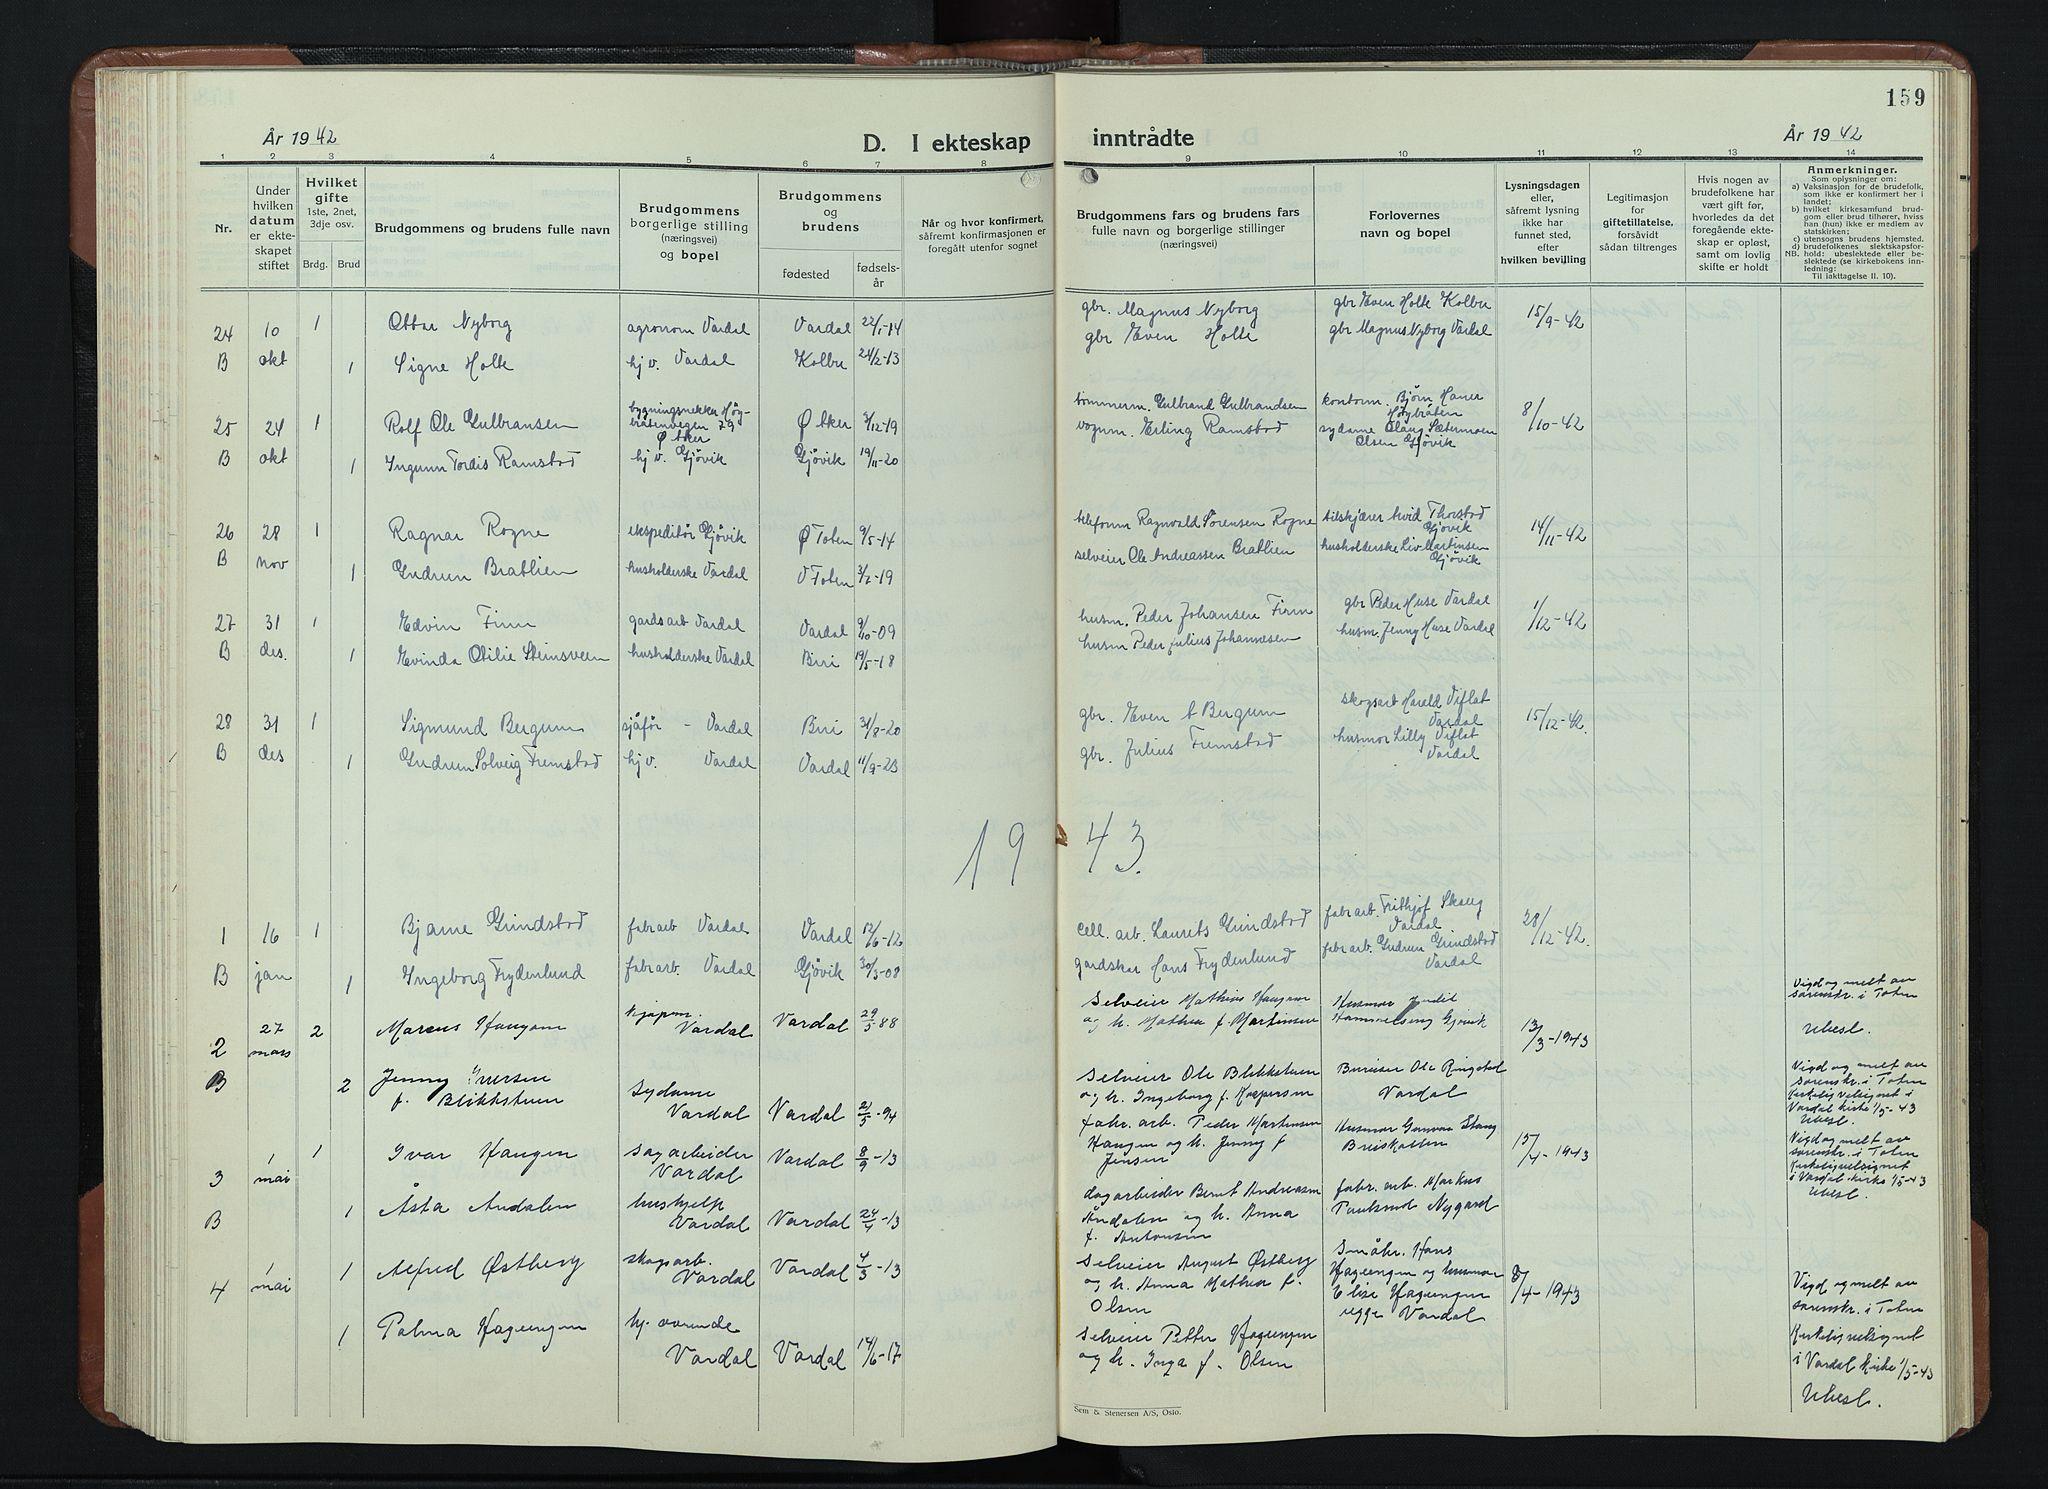 SAH, Vardal prestekontor, H/Ha/Hab/L0018: Klokkerbok nr. 18, 1931-1951, s. 159